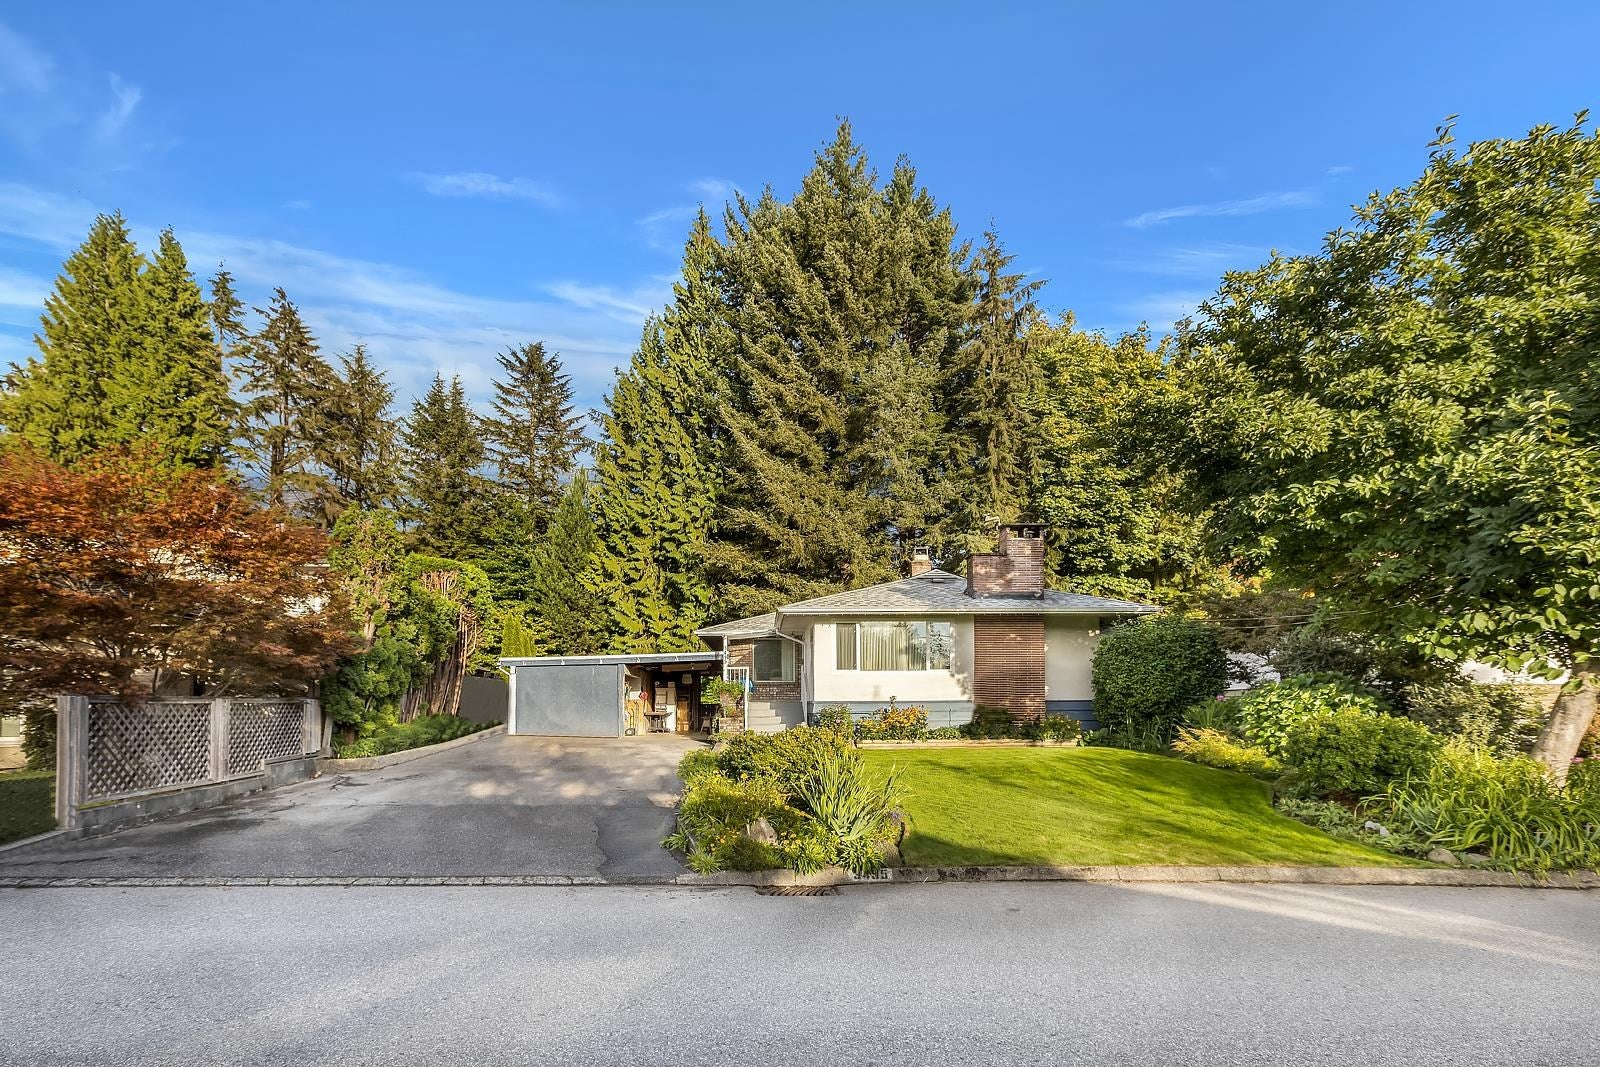 3495 WELLINGTON CRESCENT - Edgemont House/Single Family for sale, 3 Bedrooms (R2617949) - #4